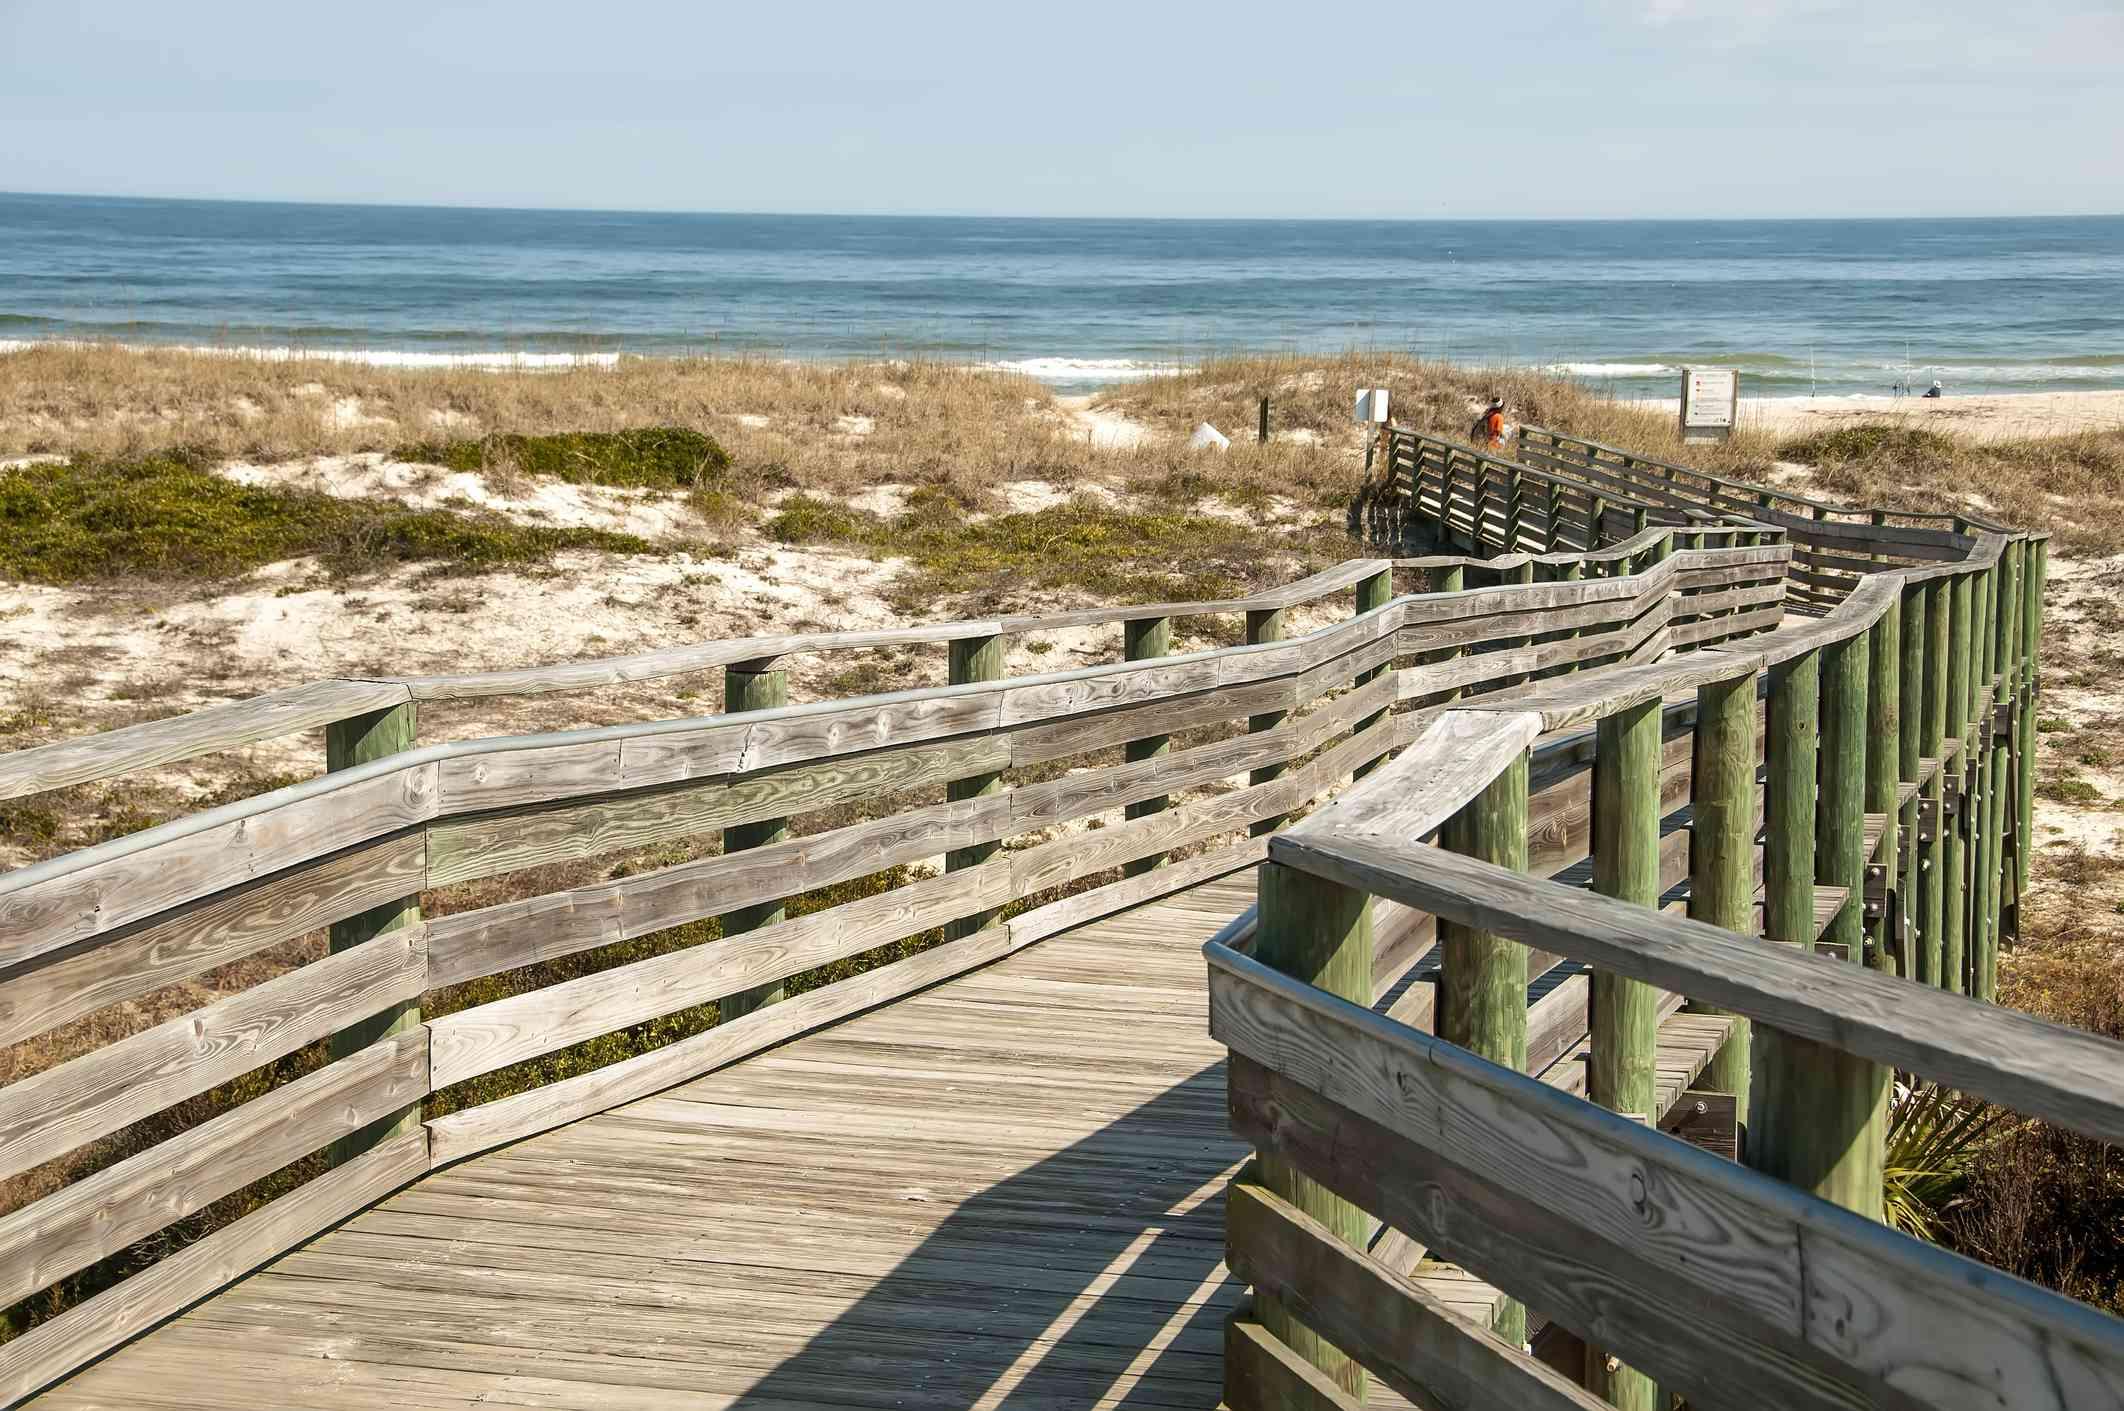 A boardwalk at Historic American Beach in Amelia Island, Florida